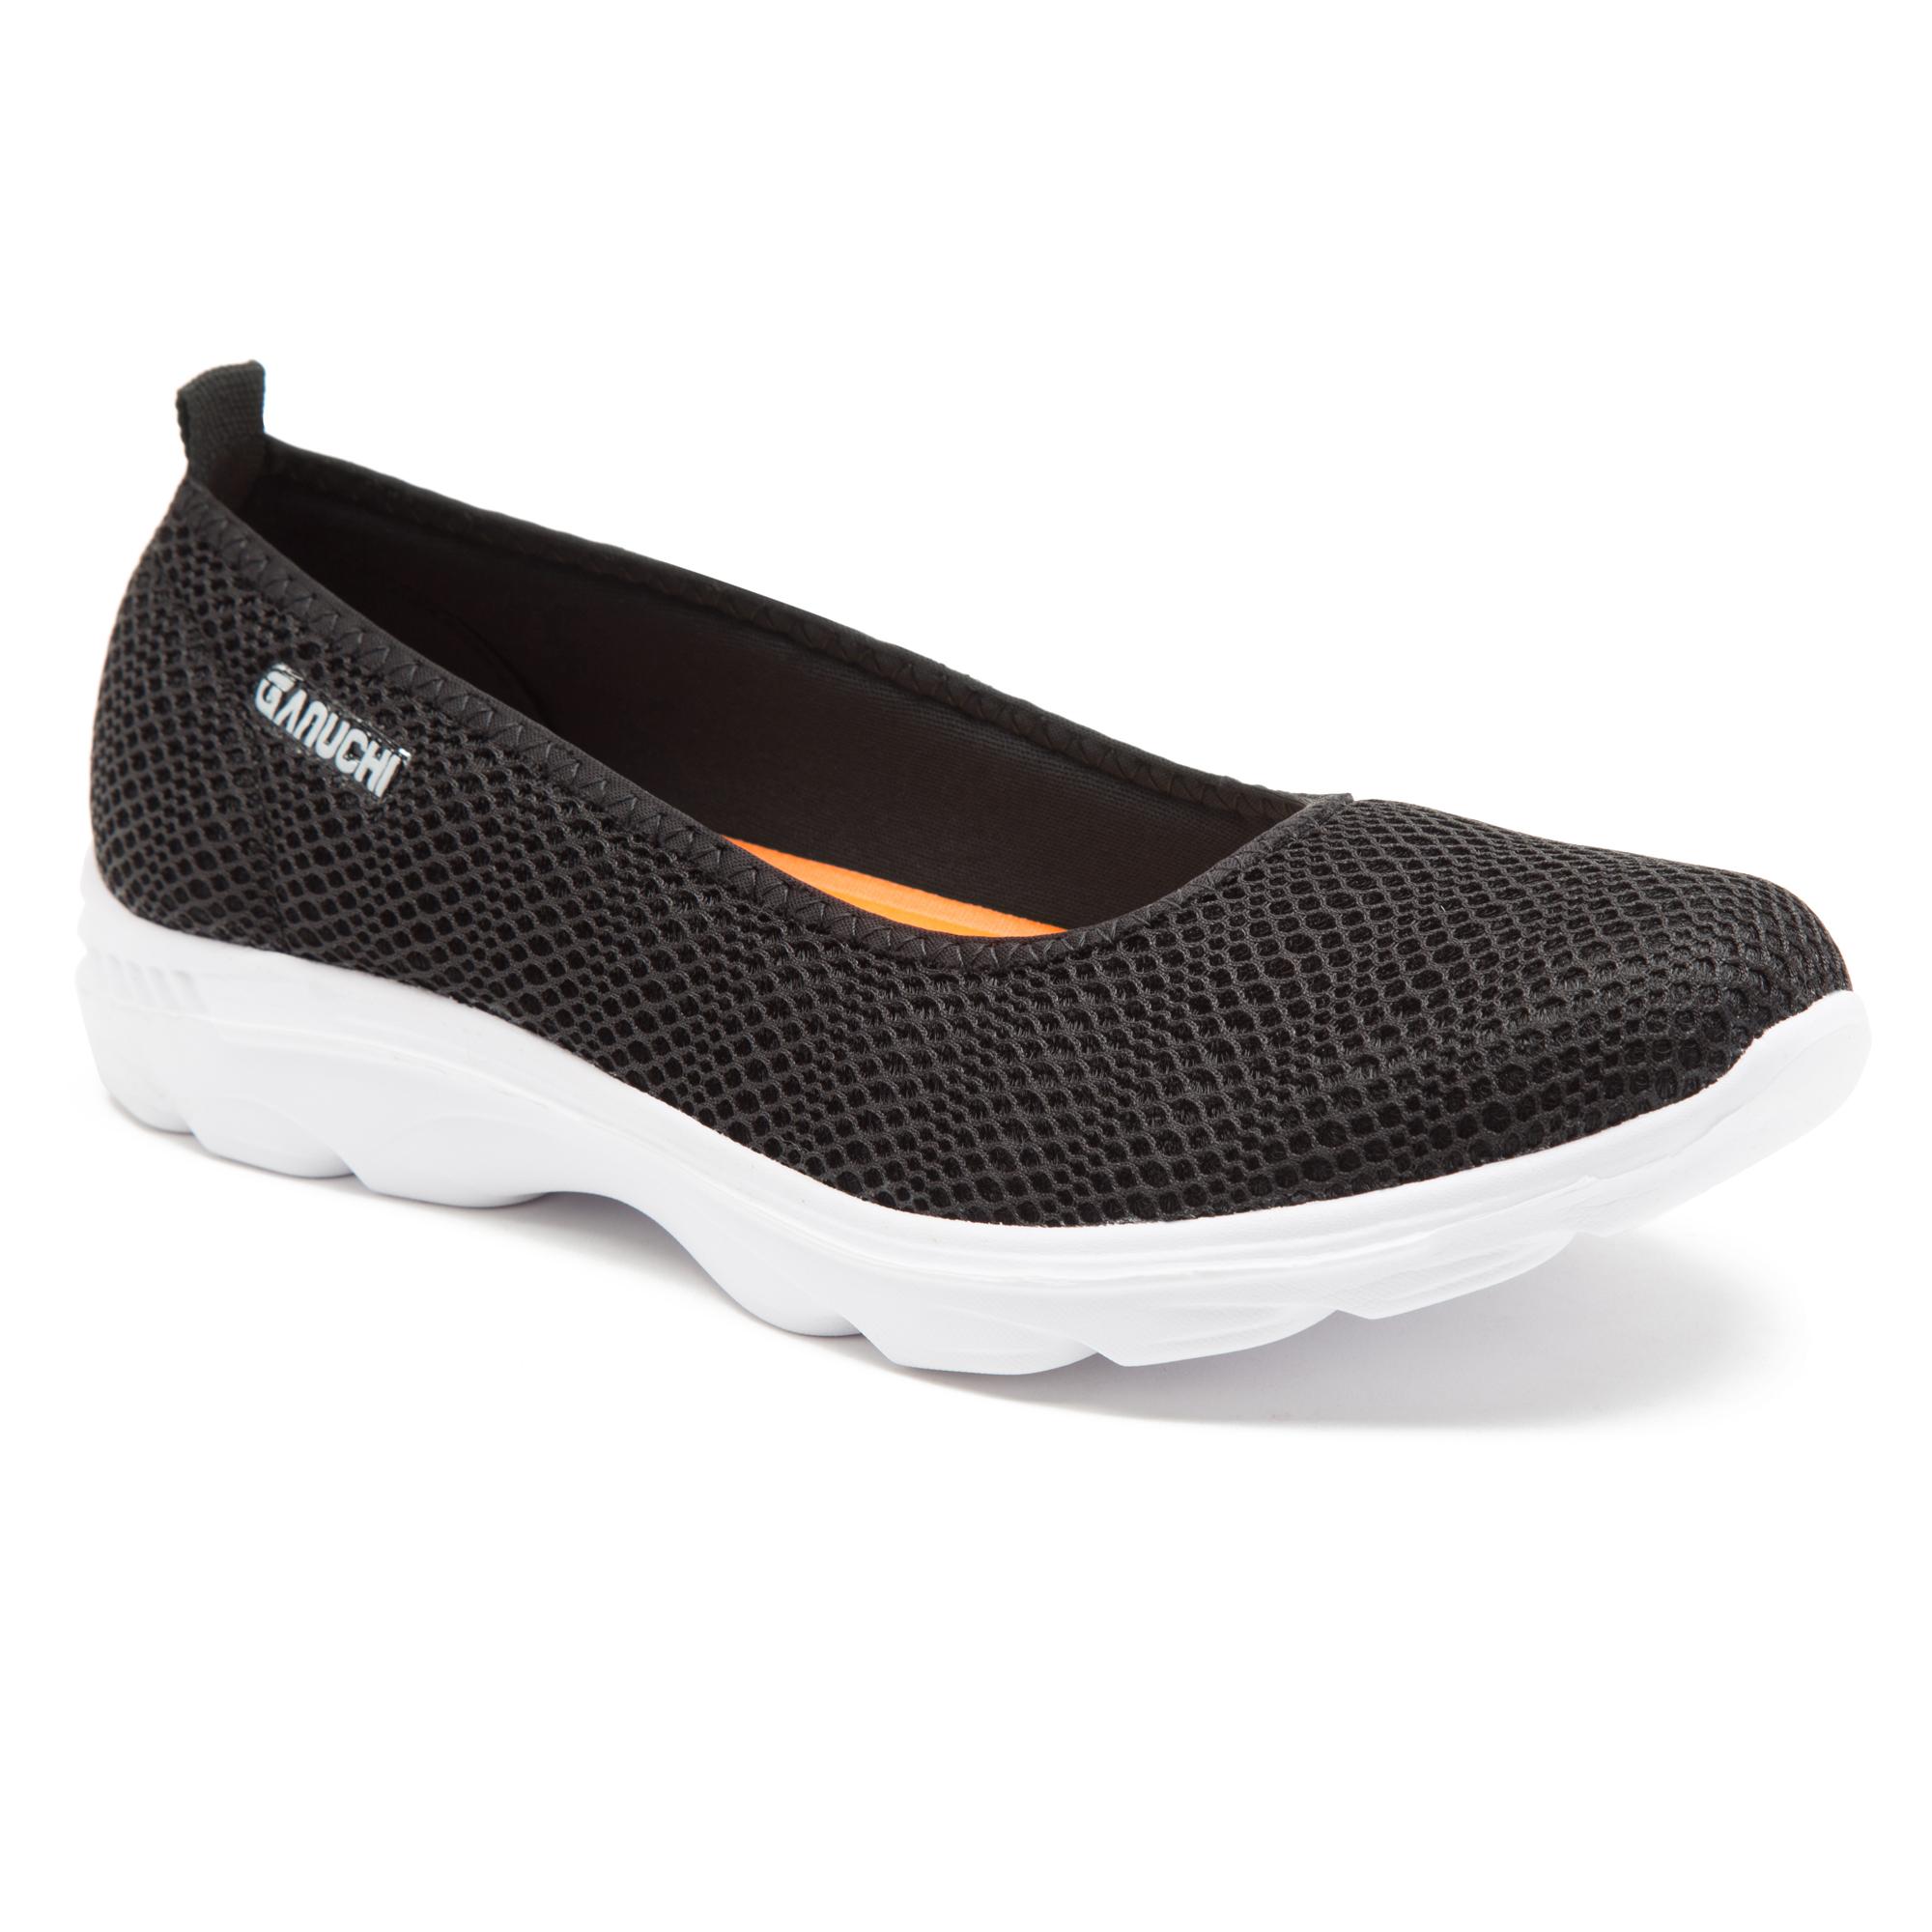 GANUCHI | Ganuchi by Franco Leone Women's Mesh Black Running Shoes